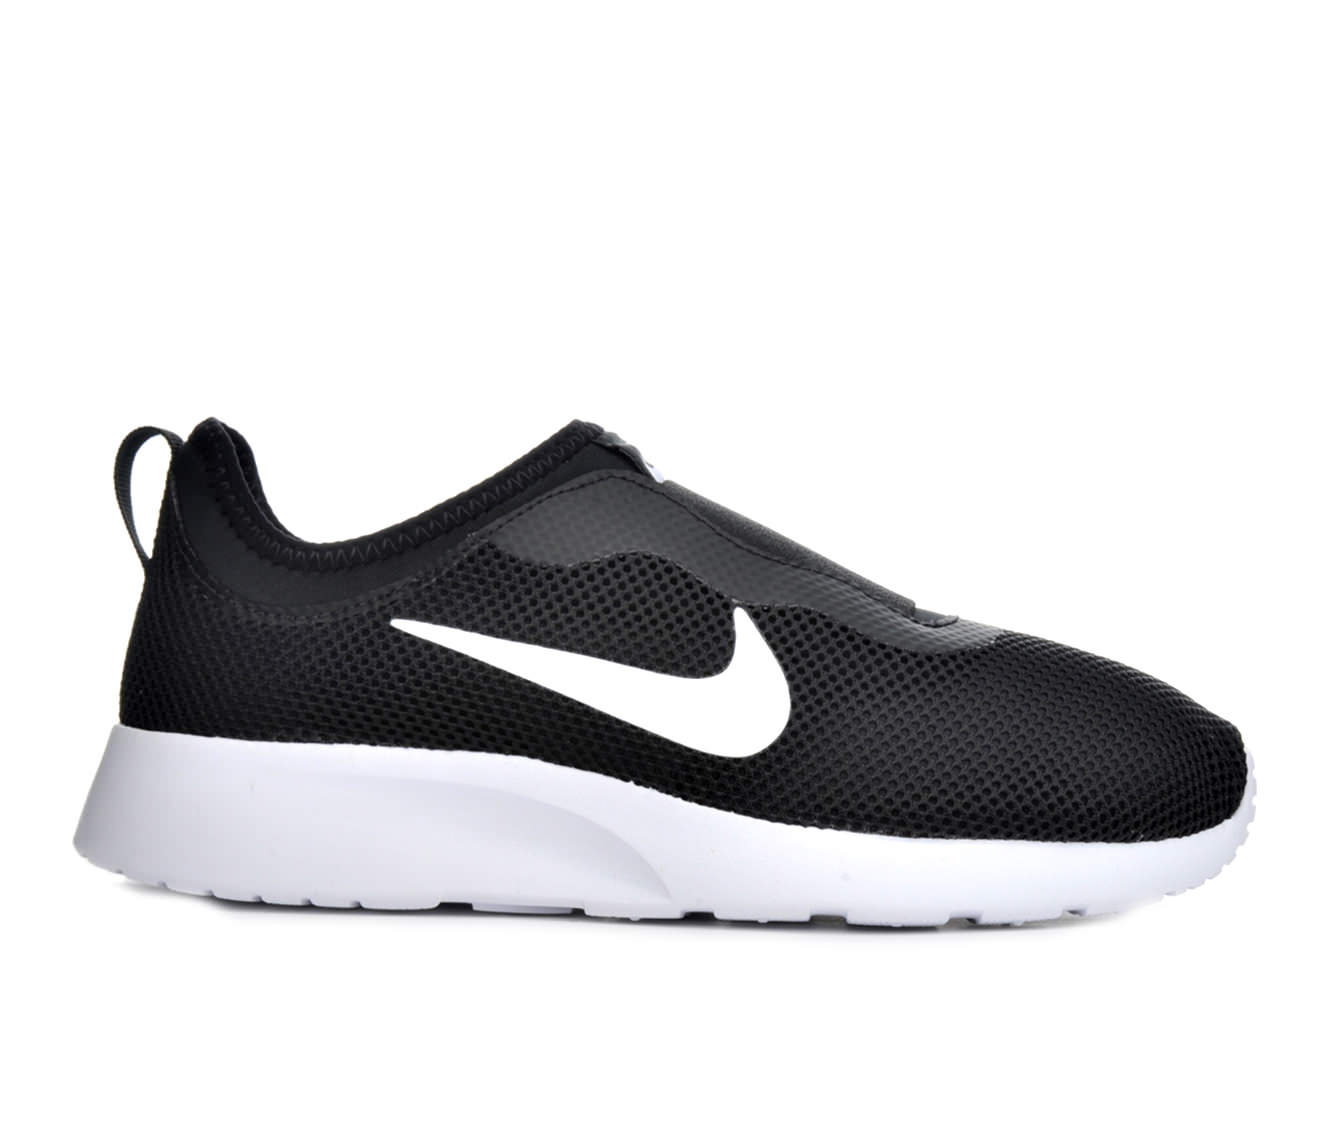 Women's Nike Tanjun Slip Sneakers (Black - Size 9) 1637809